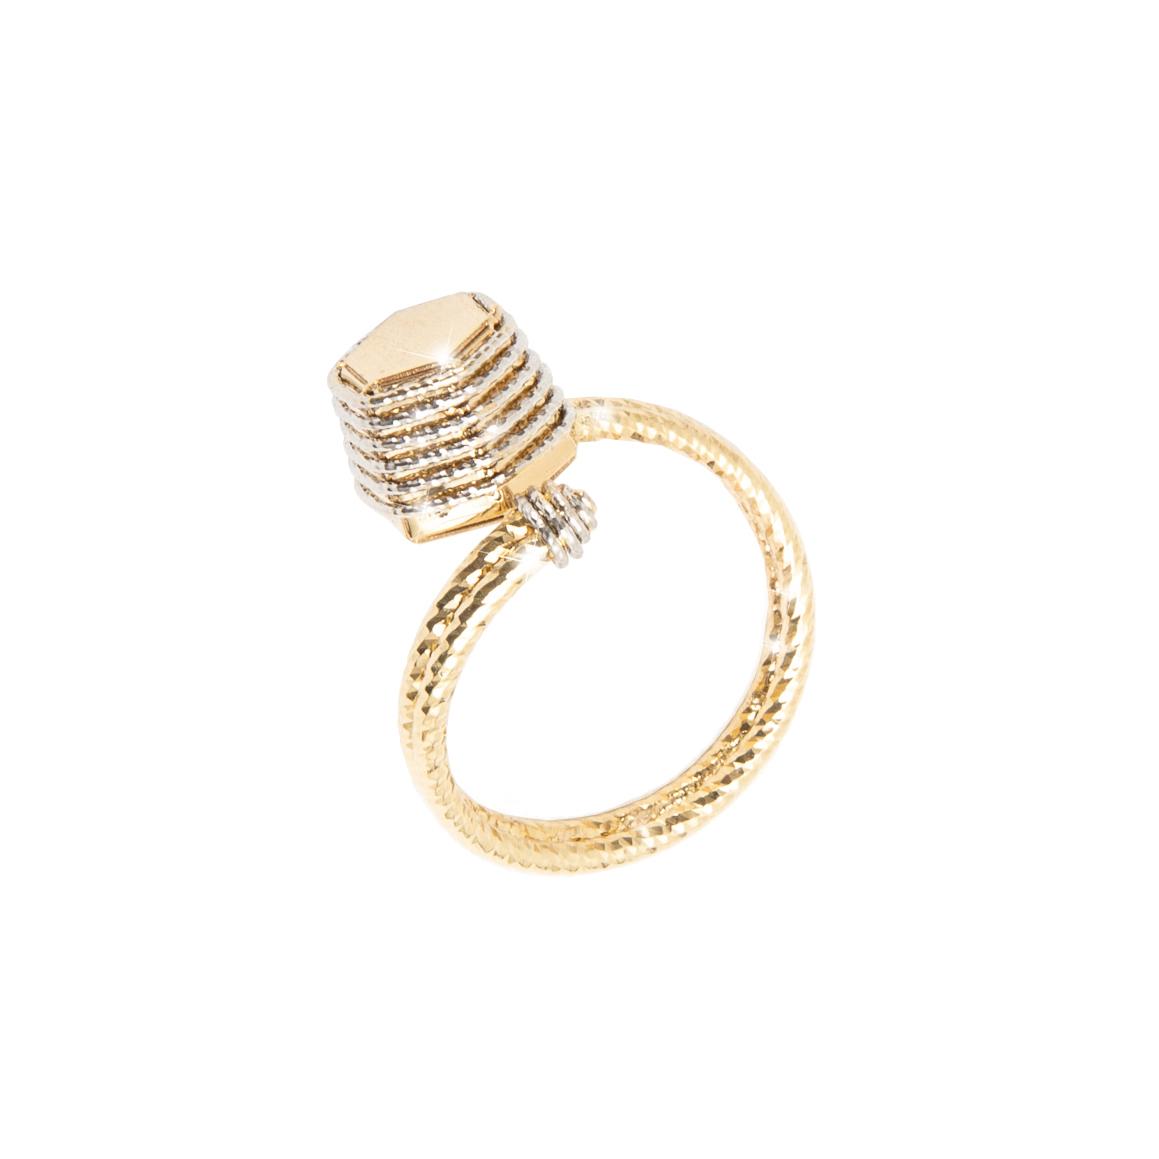 Giuliana Mancinelli Bonafaccia gold Fine Prickly Ring.jpg